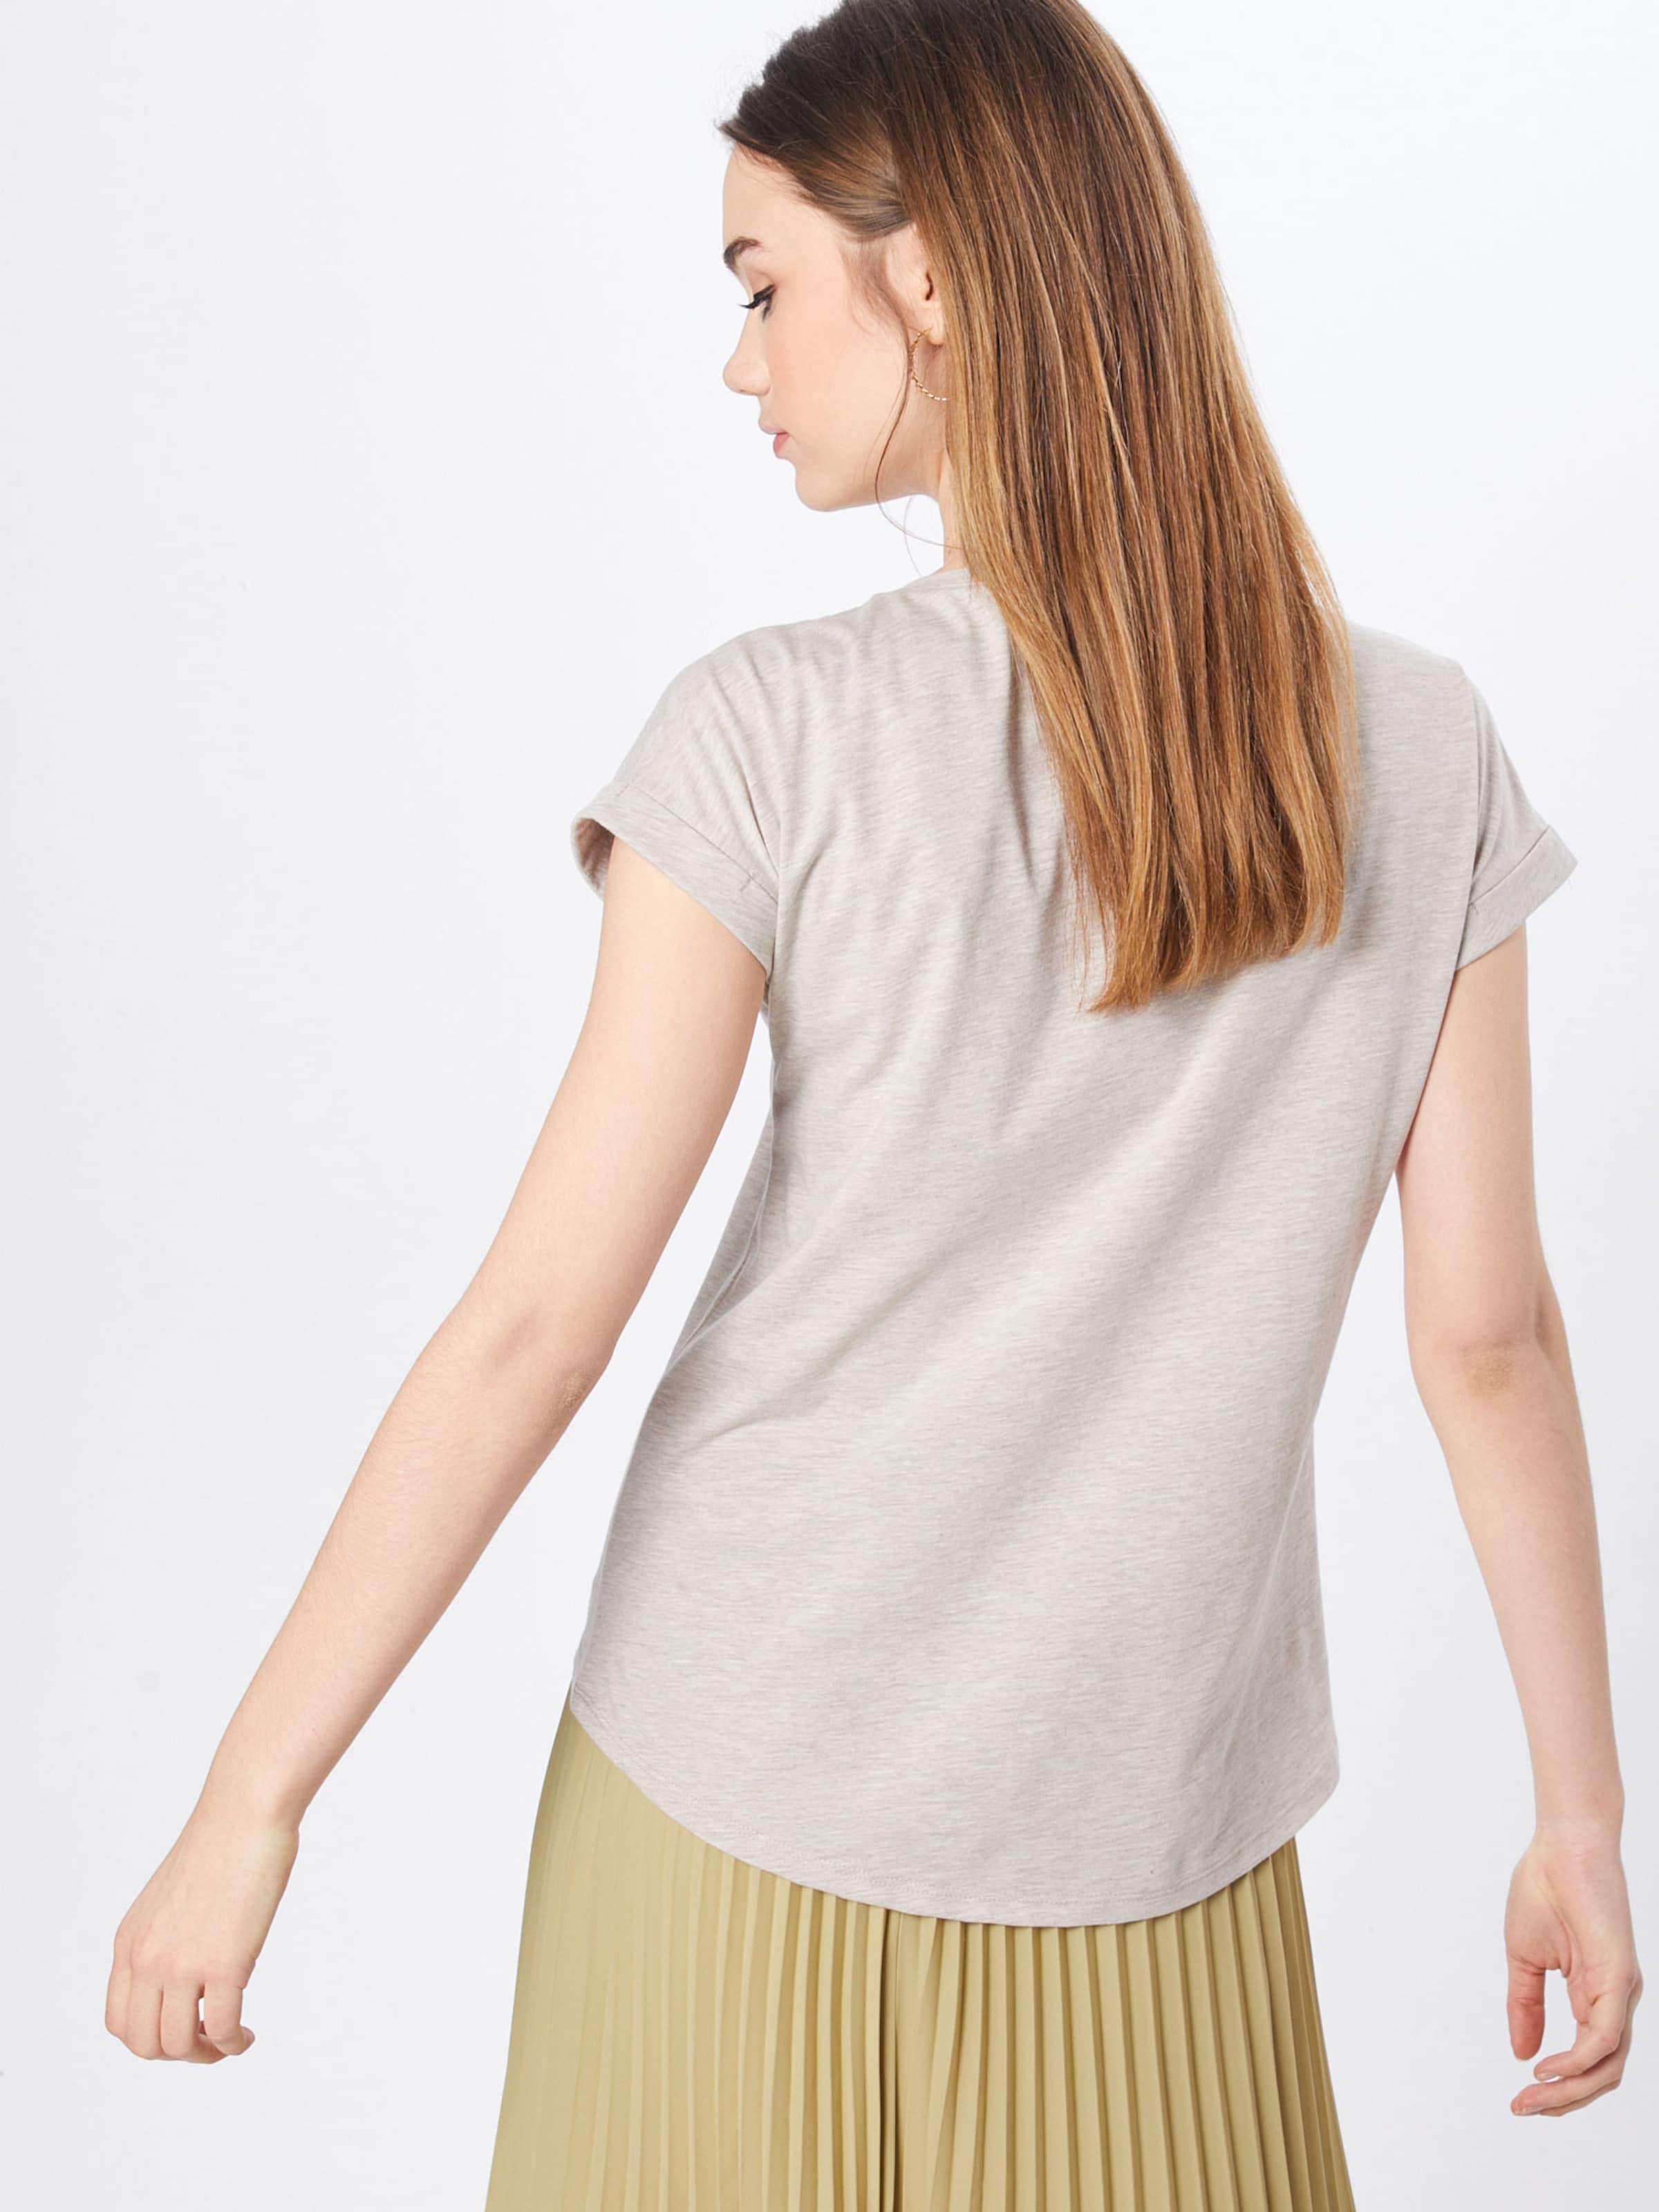 'dreamers' Shirt Vila In Beige fIgYb6y7v